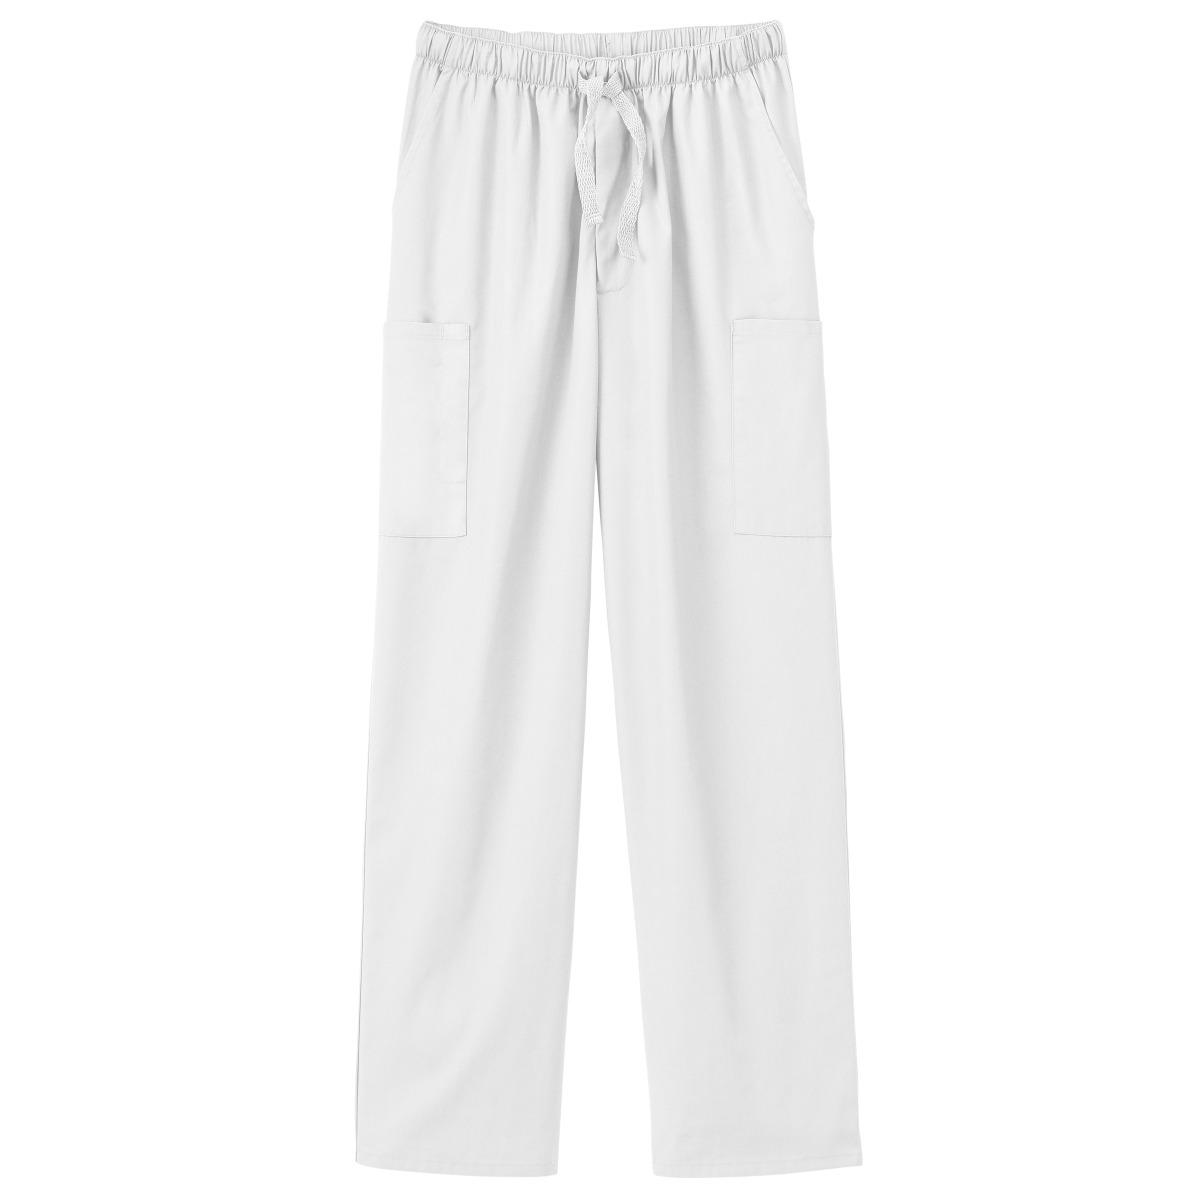 White Swan Fundamentals Unisex Five Pocket Zip Pant